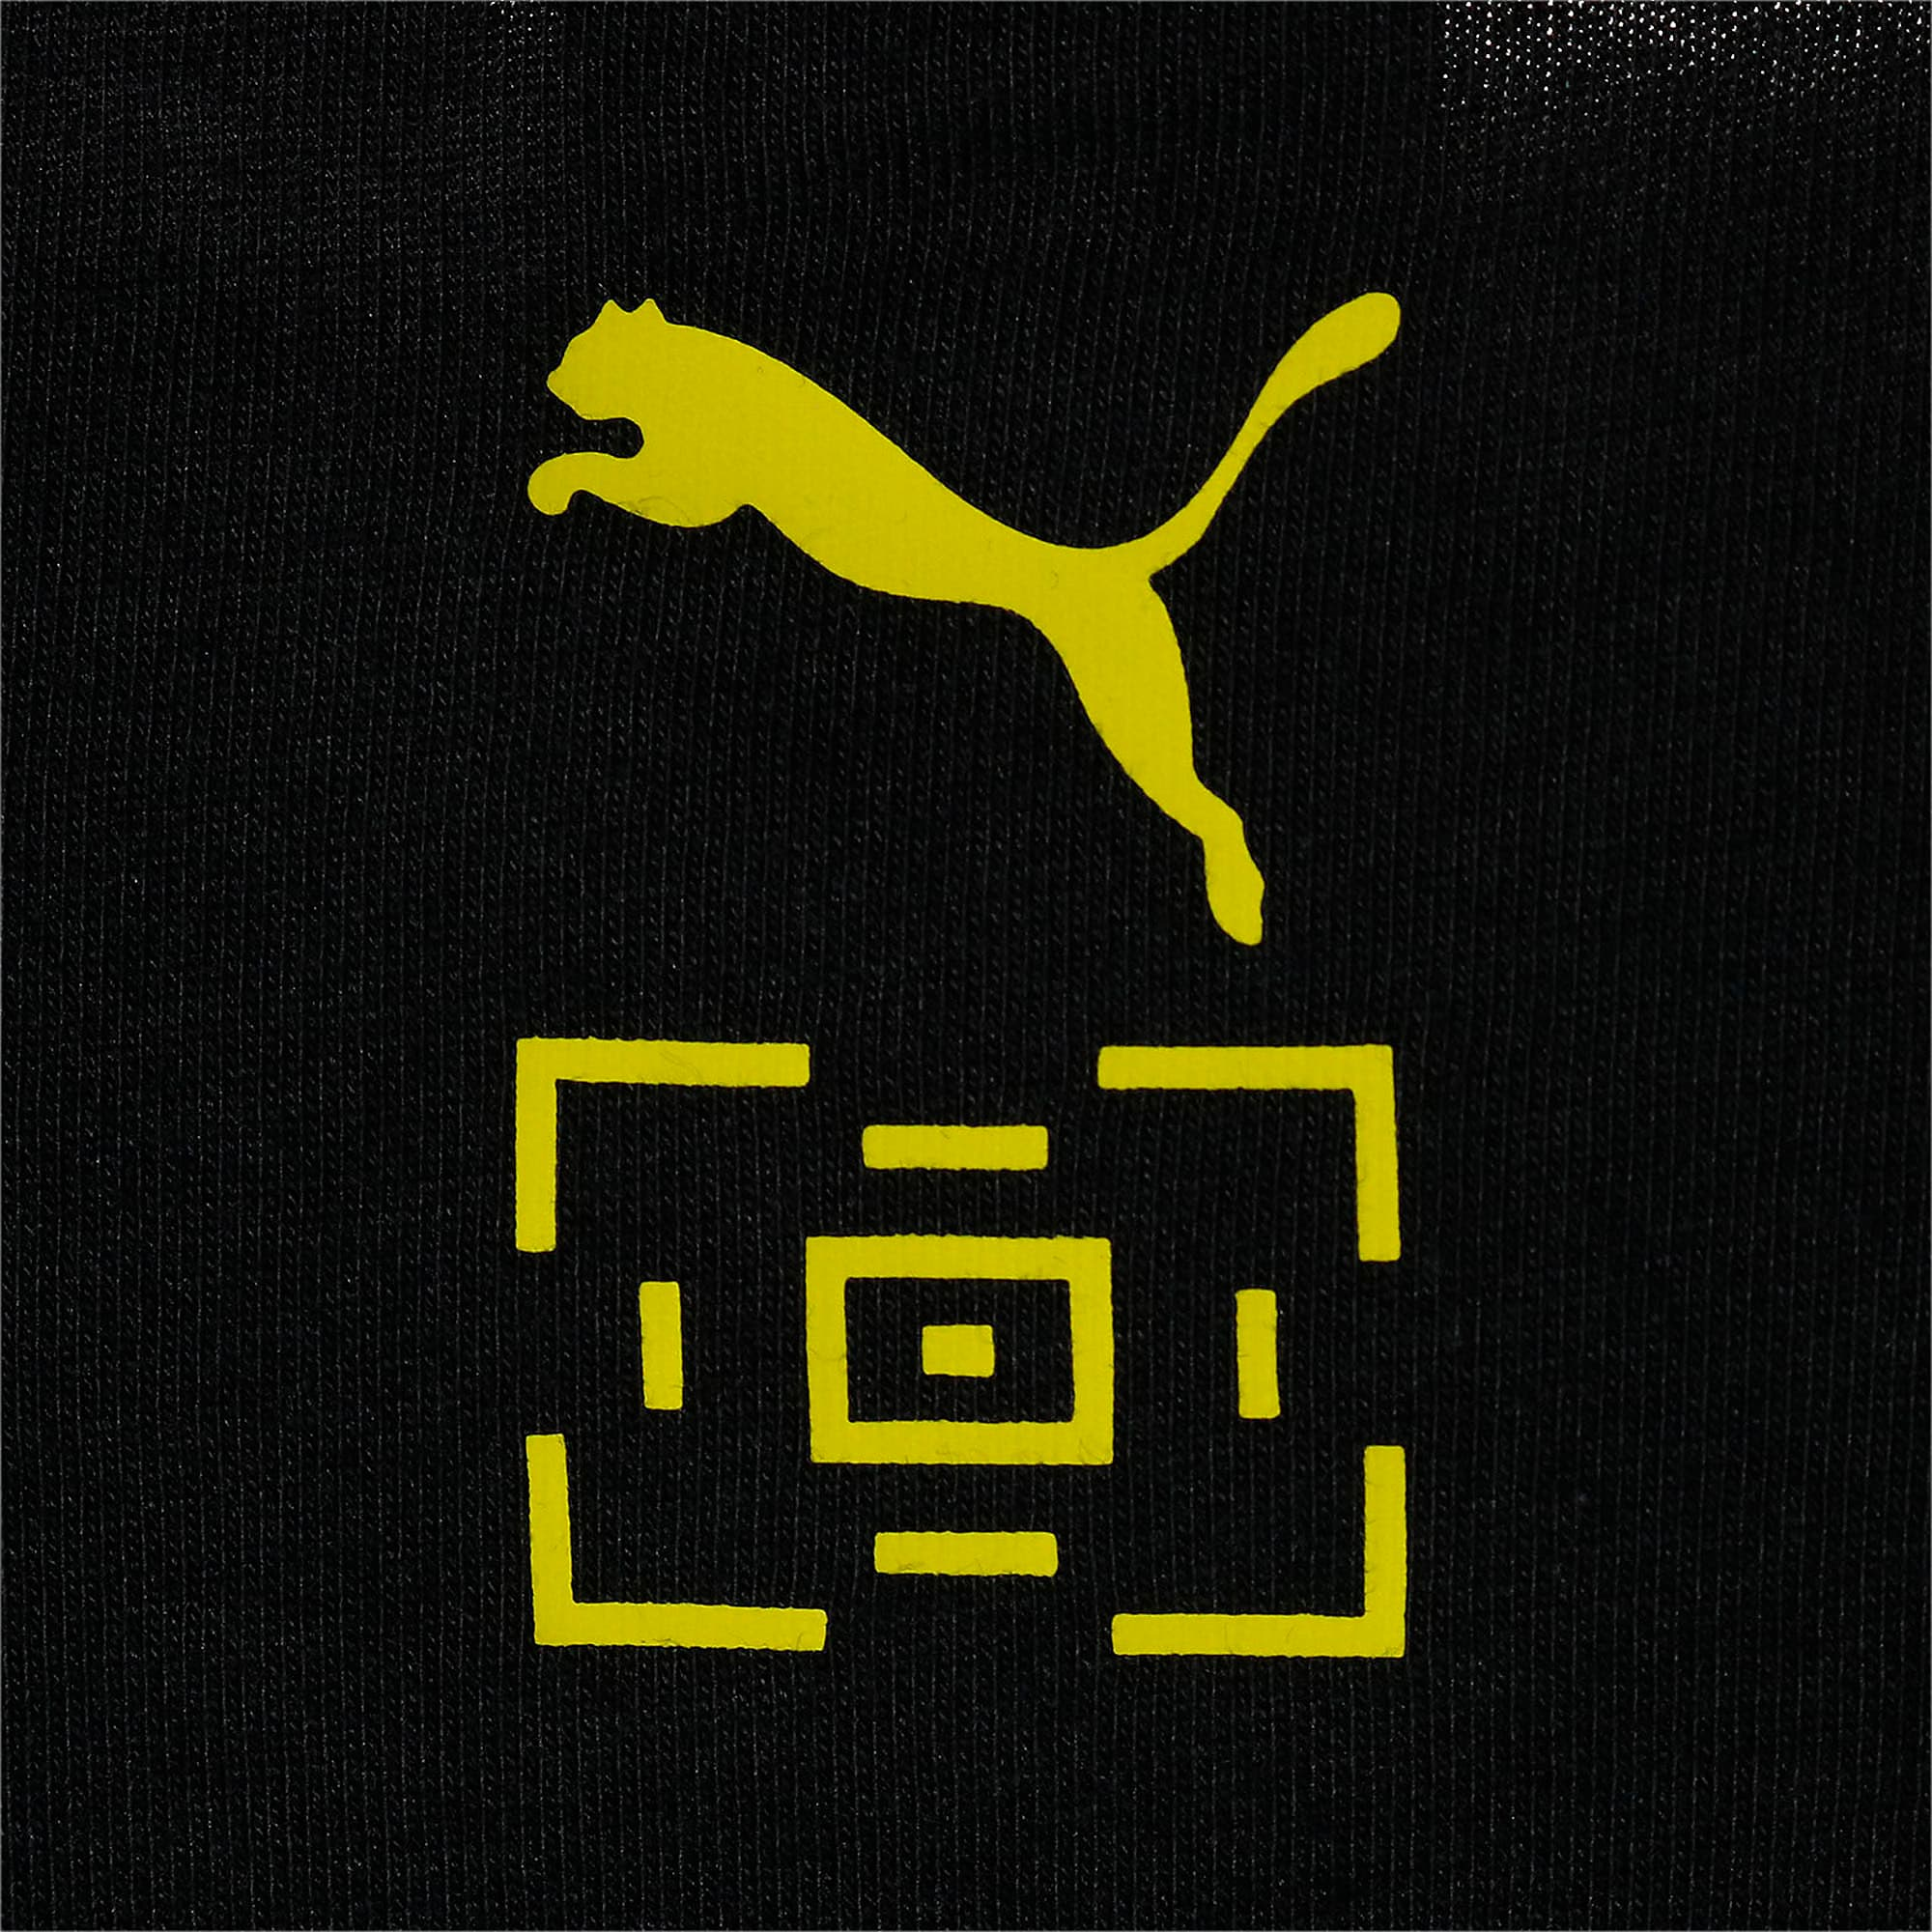 Thumbnail 10 of PUMA x LES BENJAMINS Tシャツ, Puma Black, medium-JPN